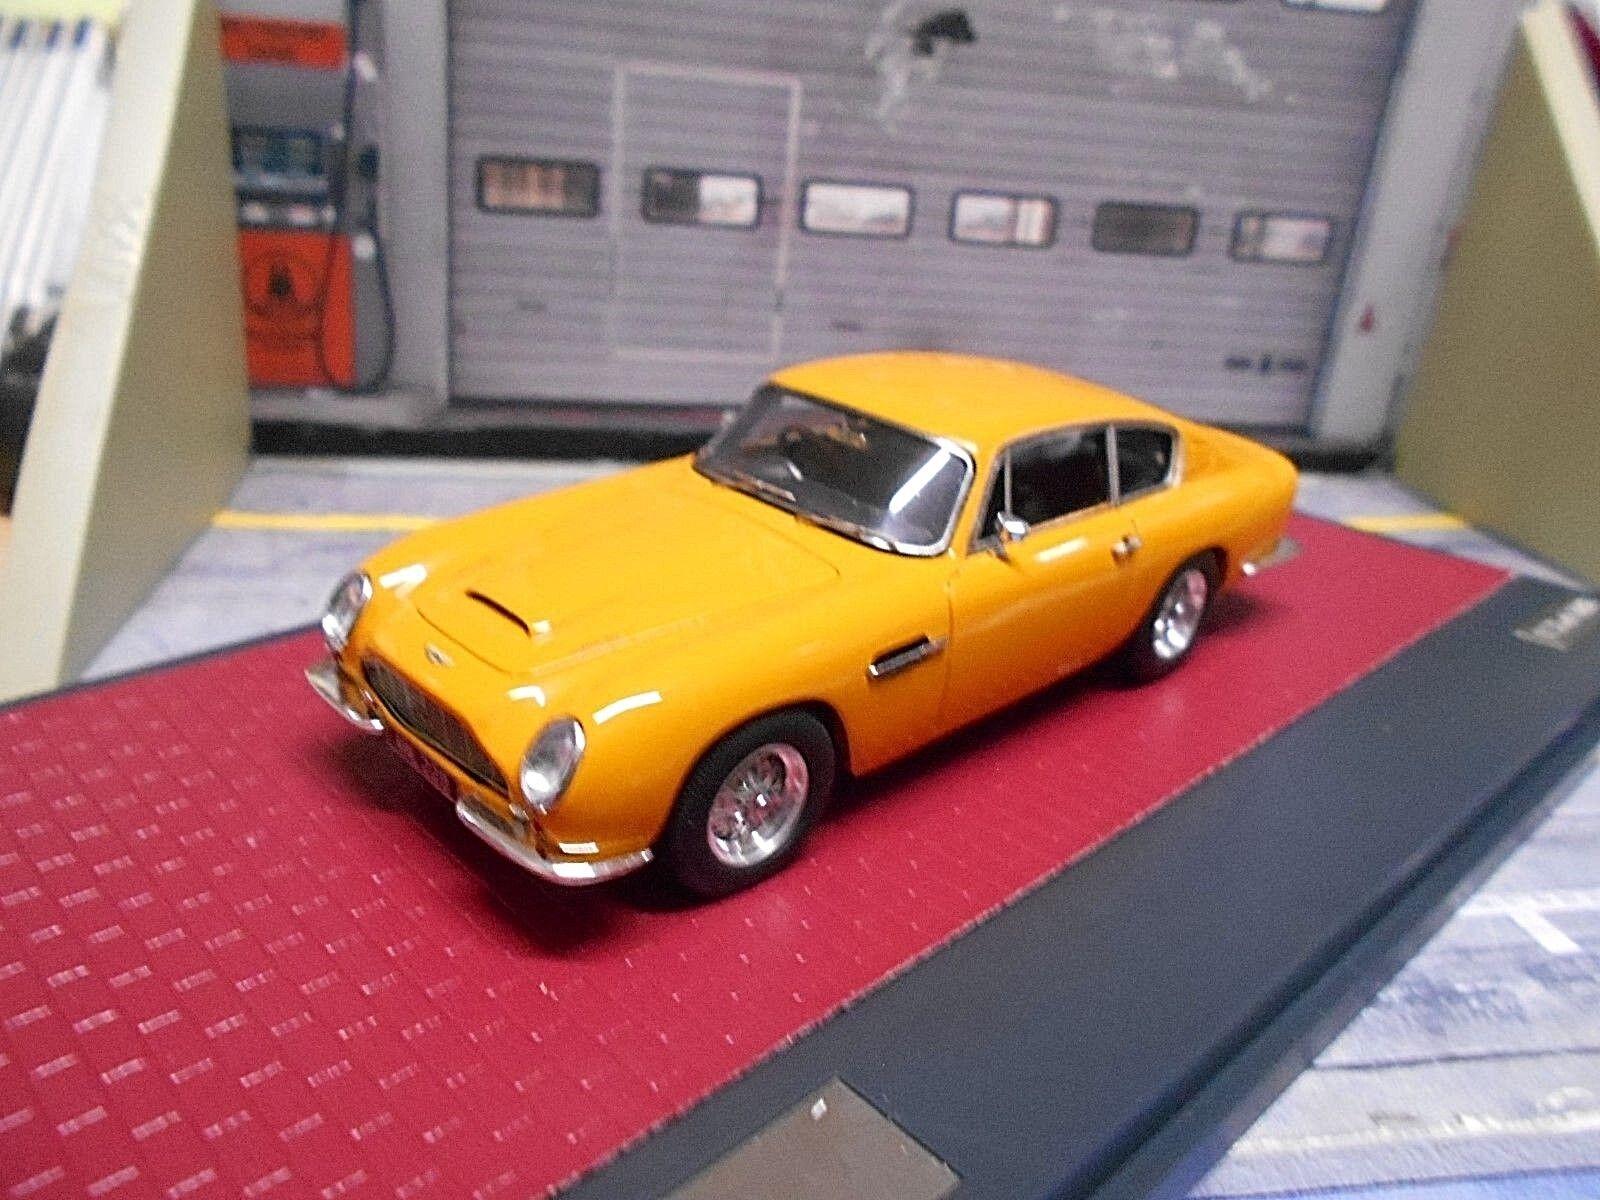 Aston Martin db6 db6 Vantage Coupe Jaune jaune 1965 Resin Haut De Gamme Matrix 1 43